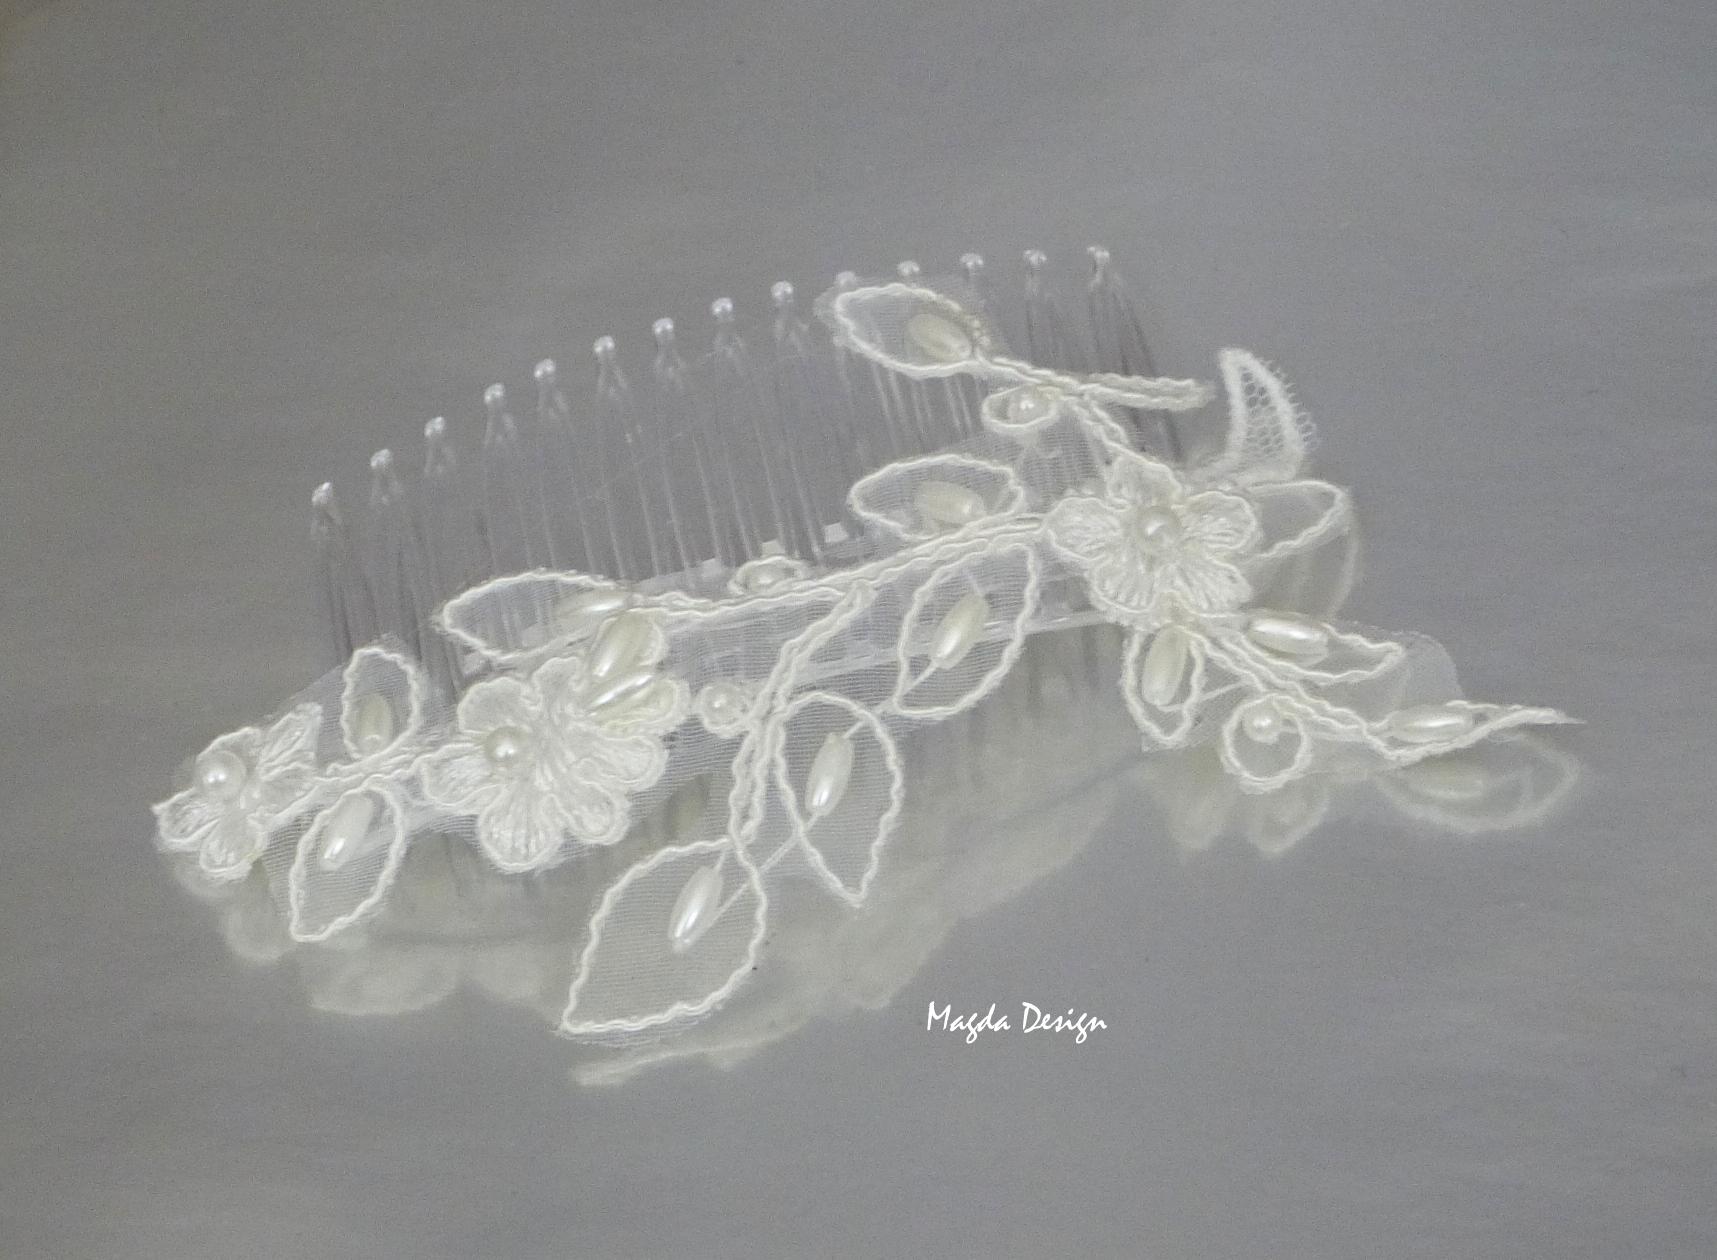 Hřeben krajkový s perličkami 2 6ceca7ea88